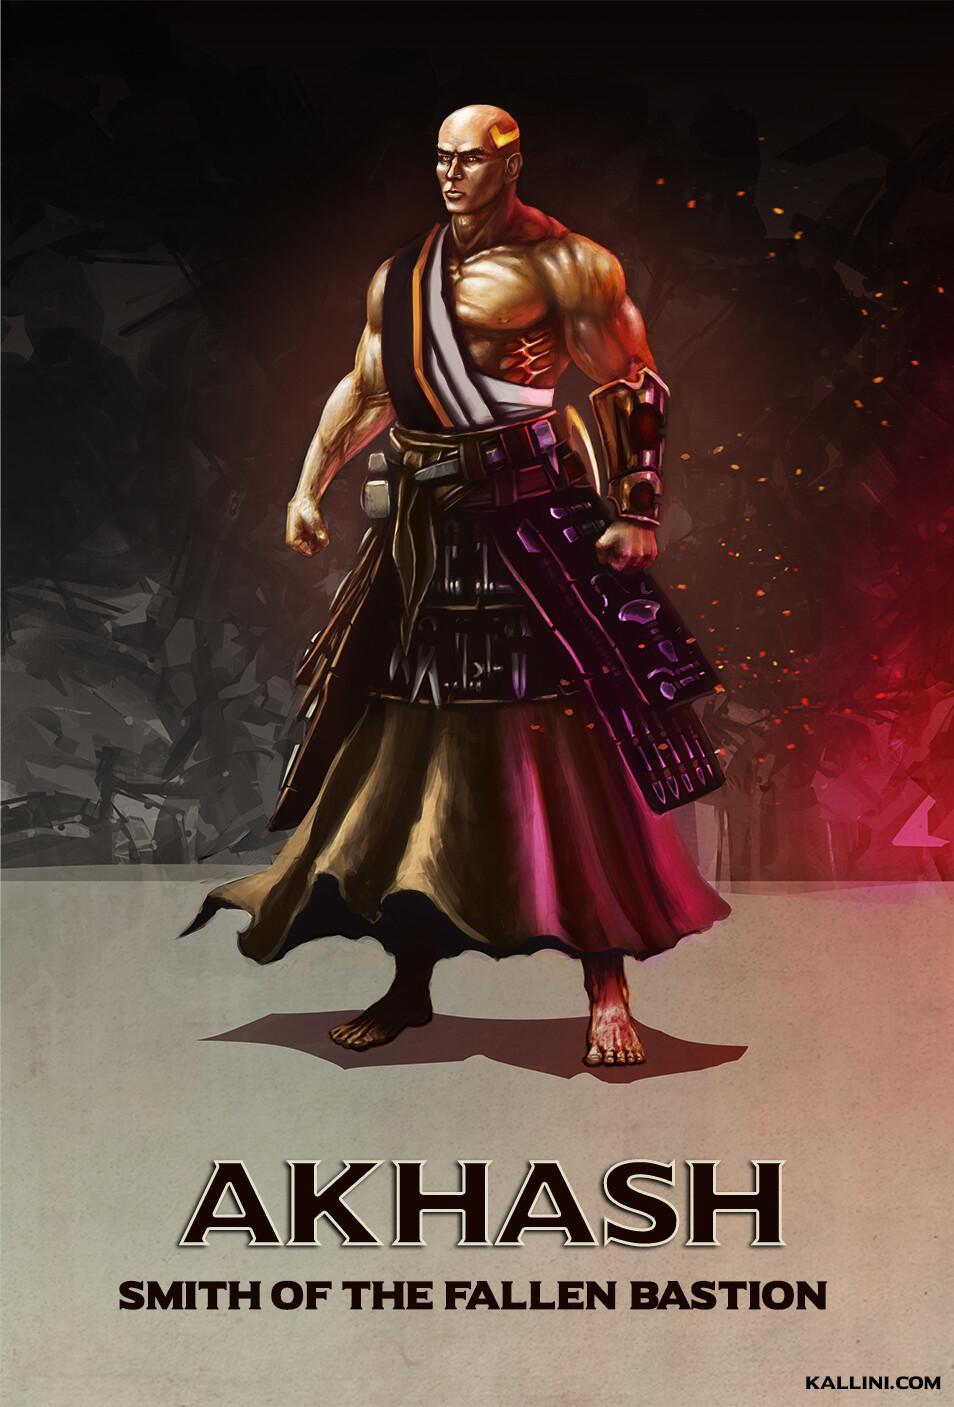 Akhash, the Smith